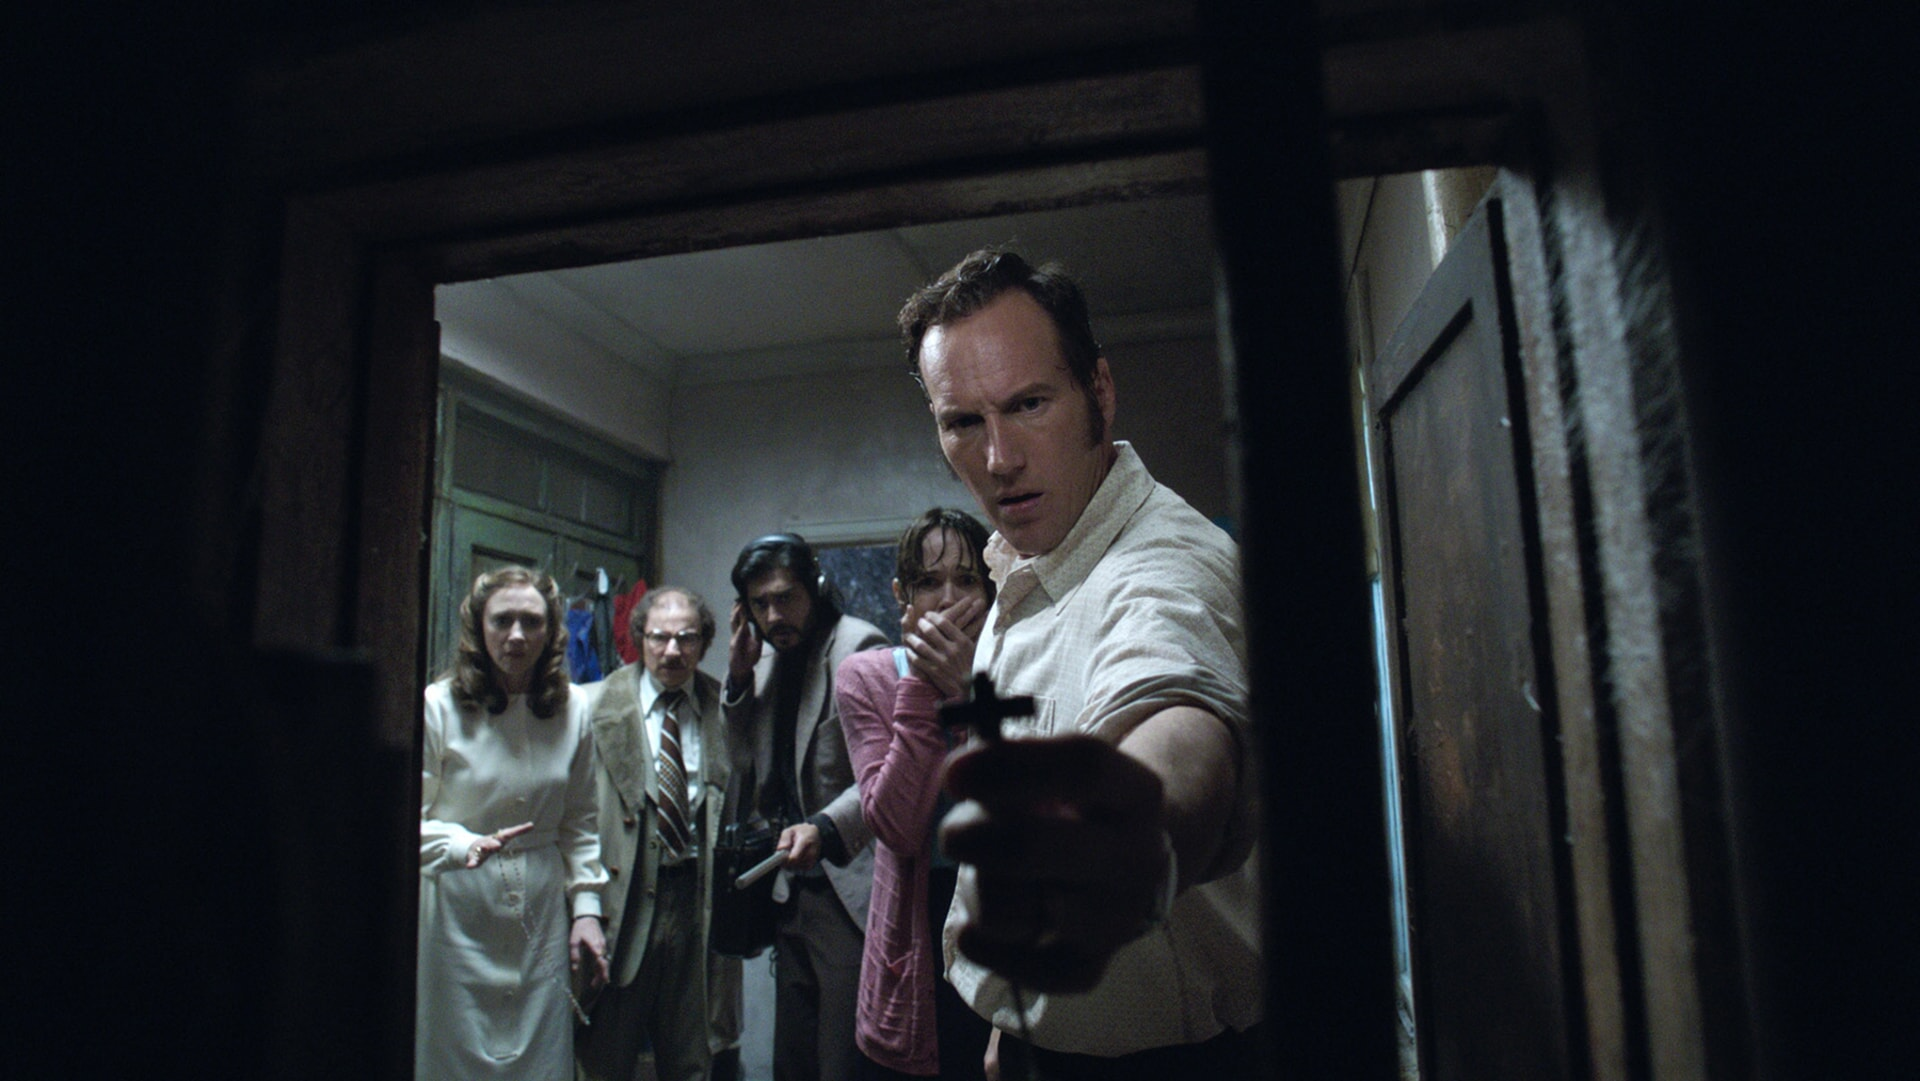 VERA FARMIGA as Lorraine Warren, SIMON McBURNEY as Maurice Grosse, ABHI SINHA as Harry Whitmark, FRANCES O'CONNOR as Peggy Hodgson and PATRICK WILSON as Ed Warren, who is holding up a crucifix